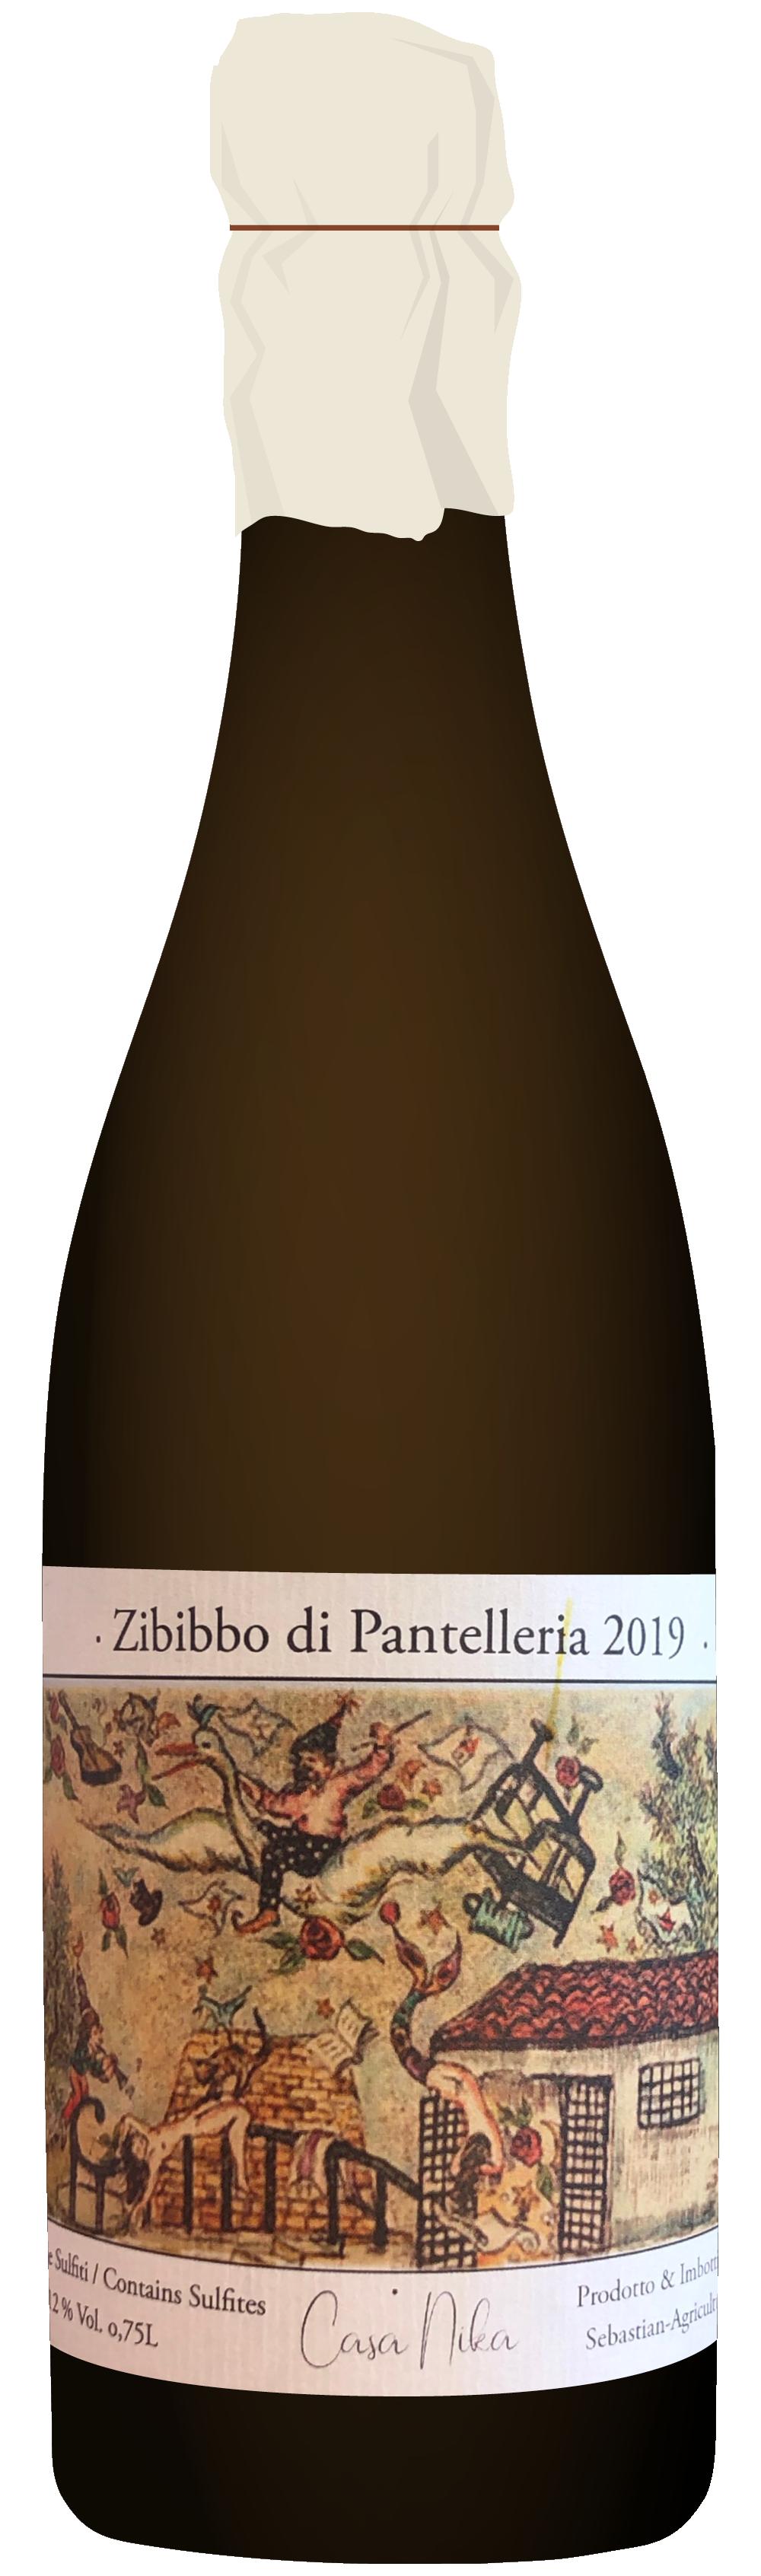 the natural wine company club february 2021 italy casa nika zibibbo di pantelleria